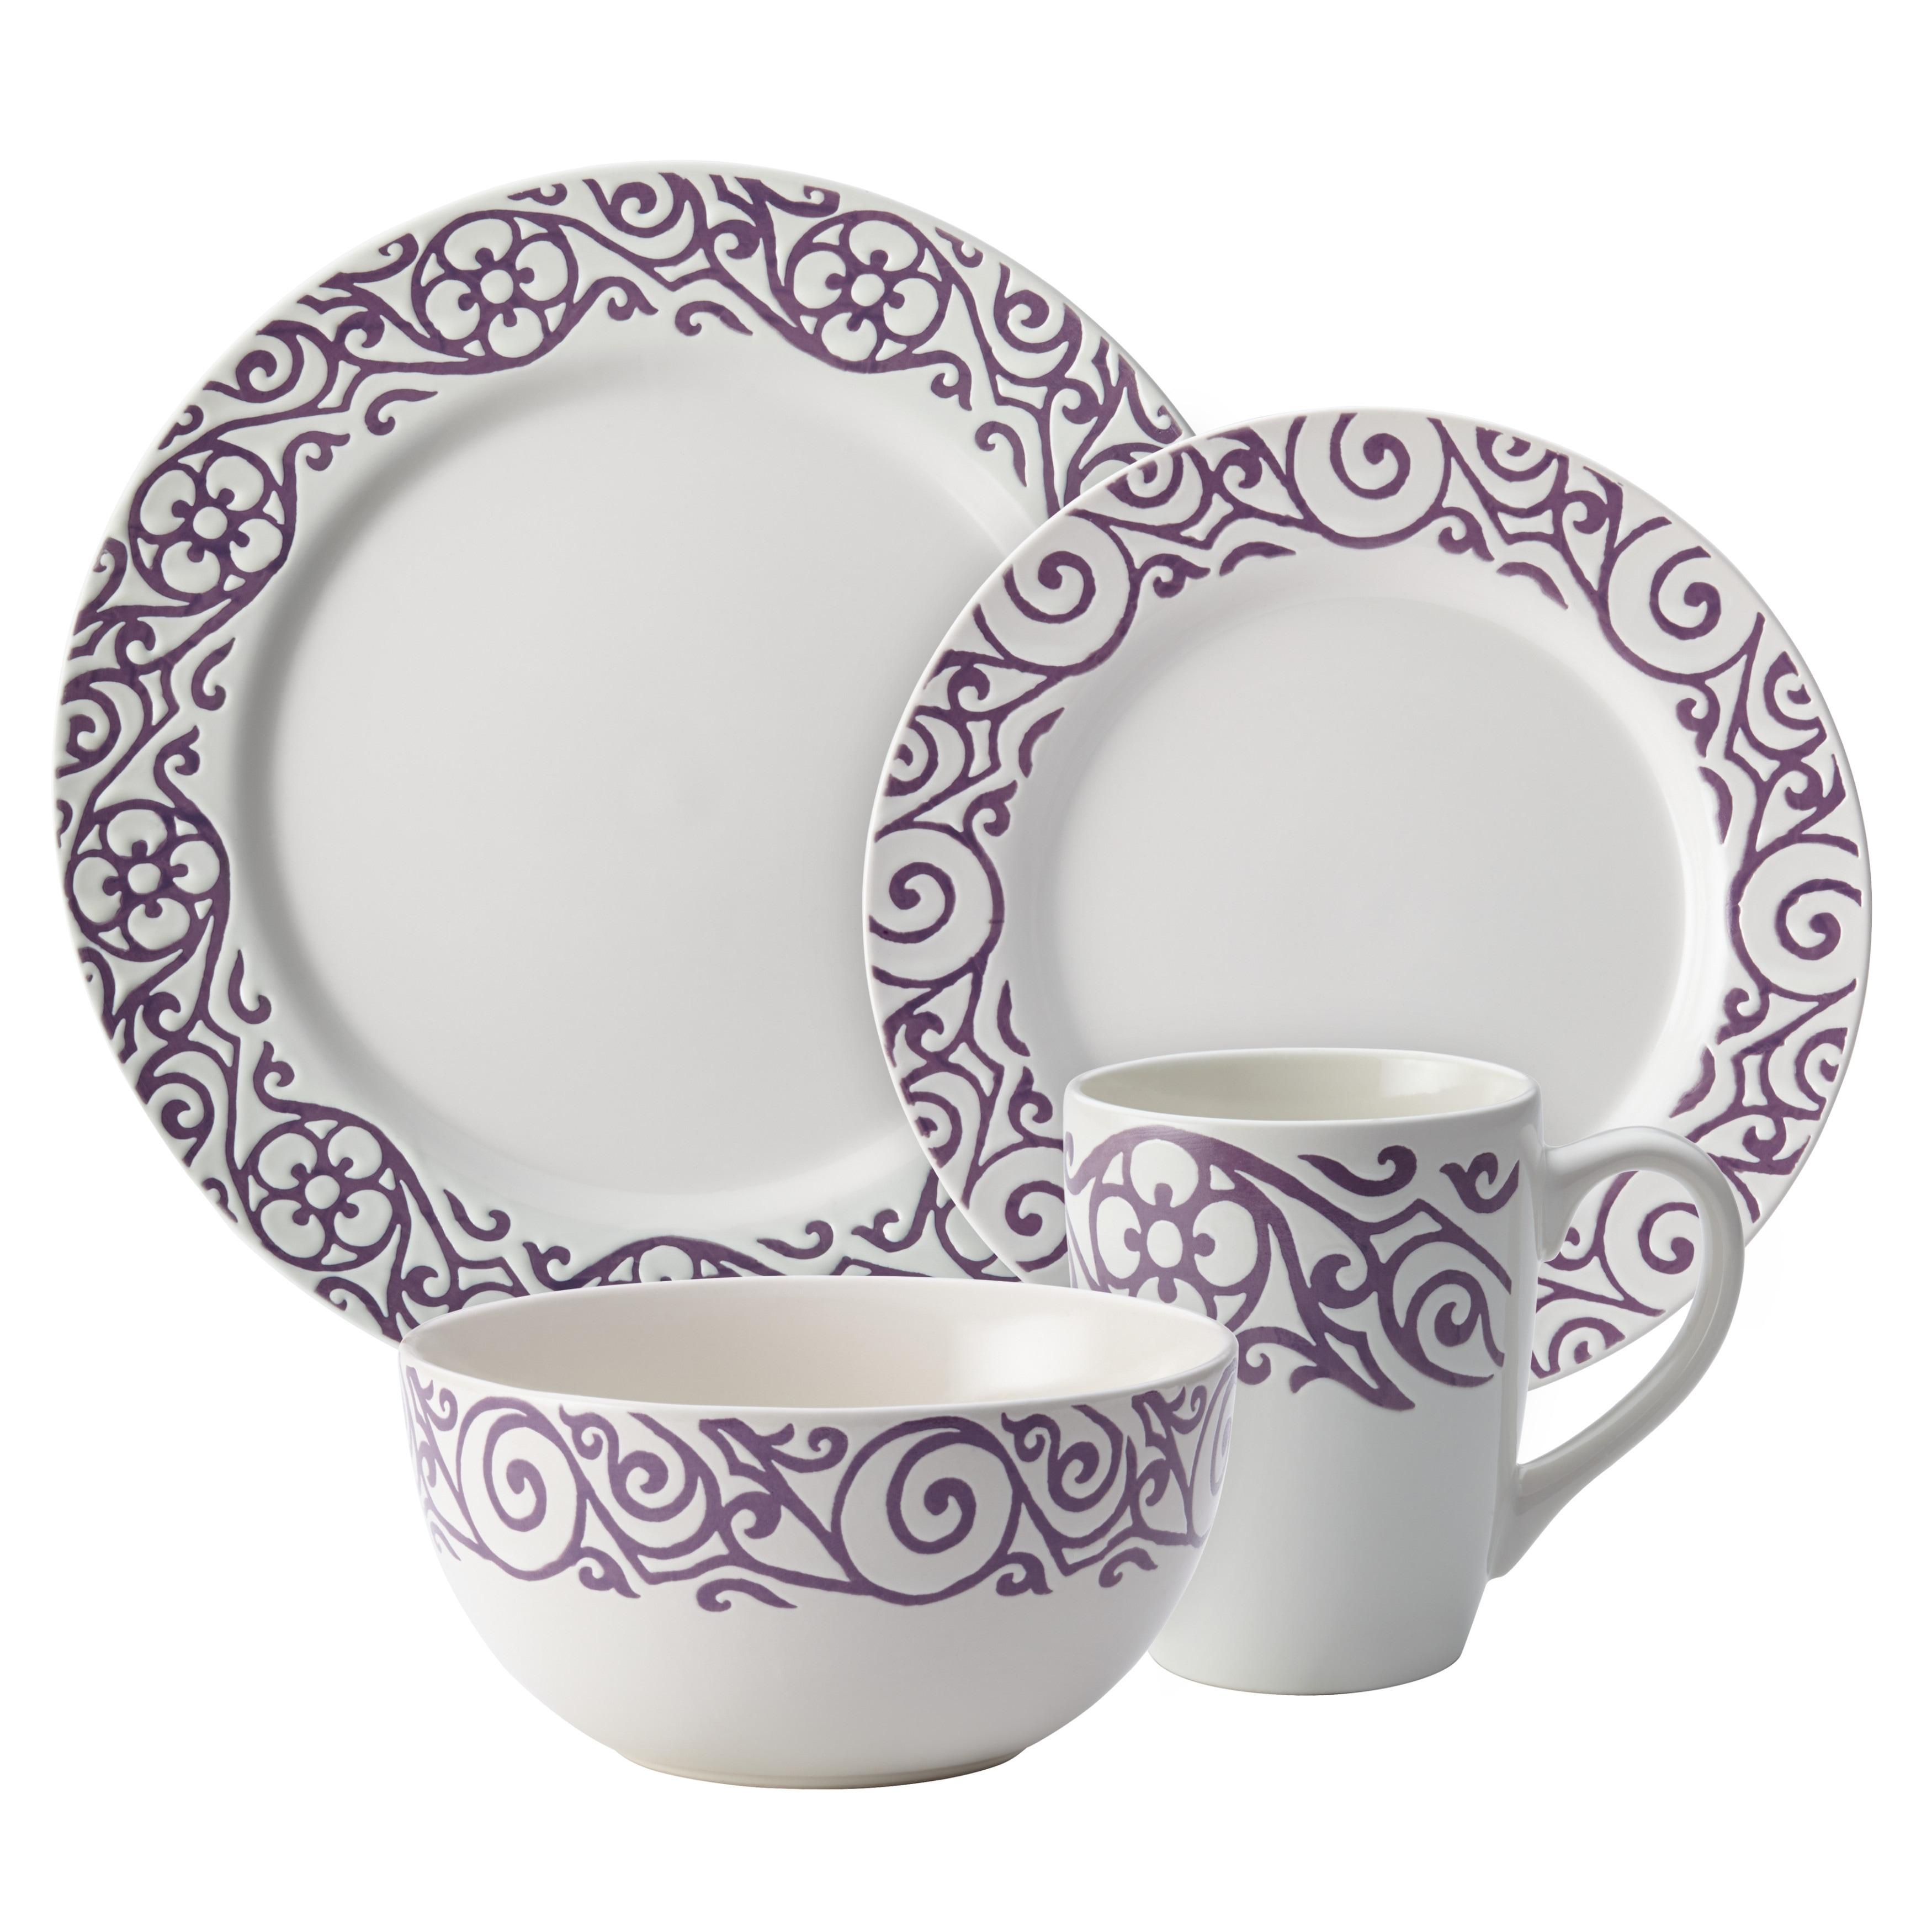 Rachael Ray Dinnerware 16-Piece Scroll Stoneware Dinnerware Set Lavender - Free Shipping Today - Overstock - 18358051  sc 1 st  Overstock.com & Rachael Ray Dinnerware 16-Piece Scroll Stoneware Dinnerware Set ...